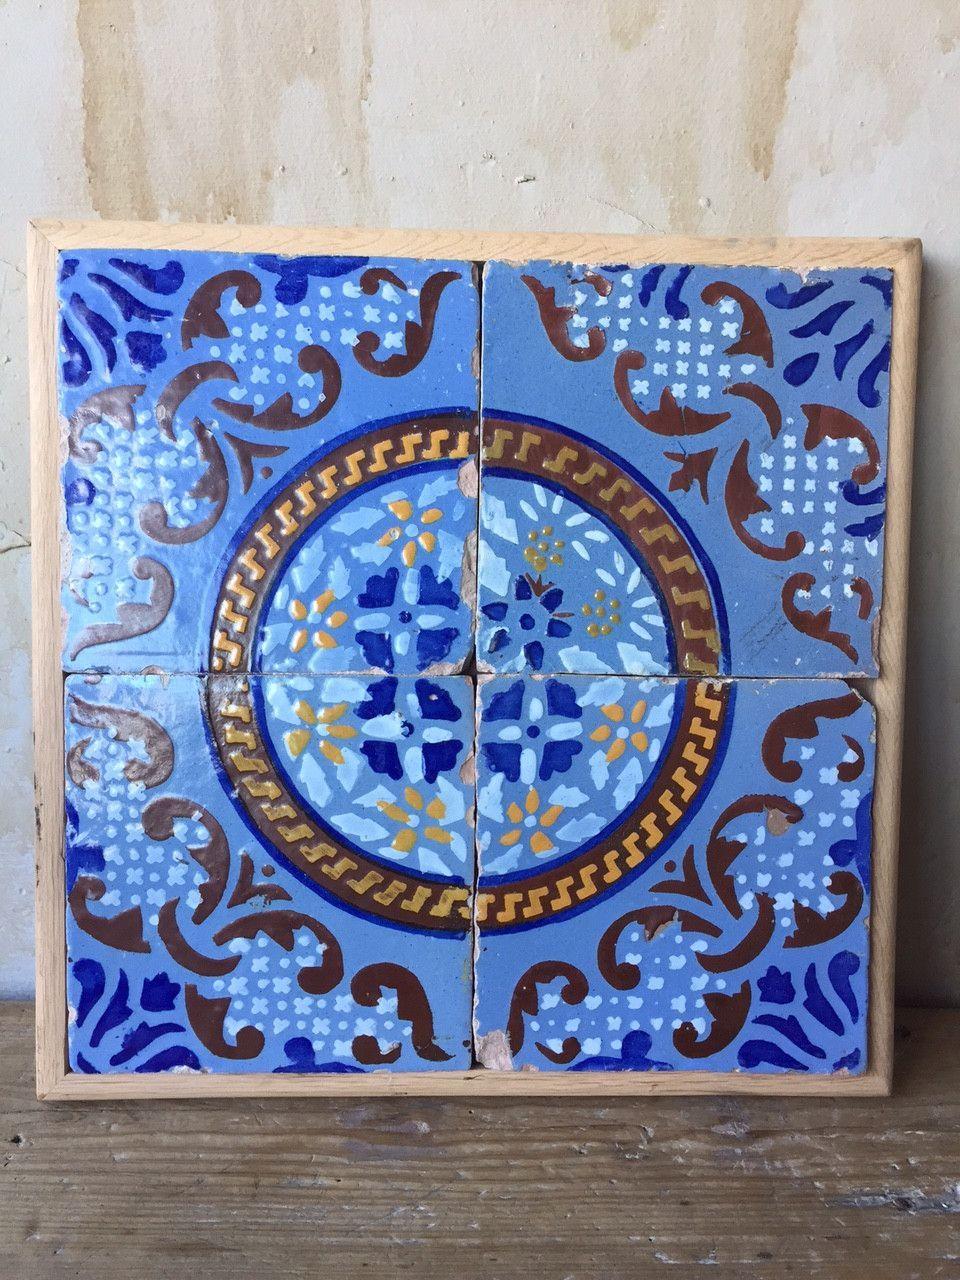 Antique Italian Tiles - 19th Century | Southern italy, Terra cotta ...